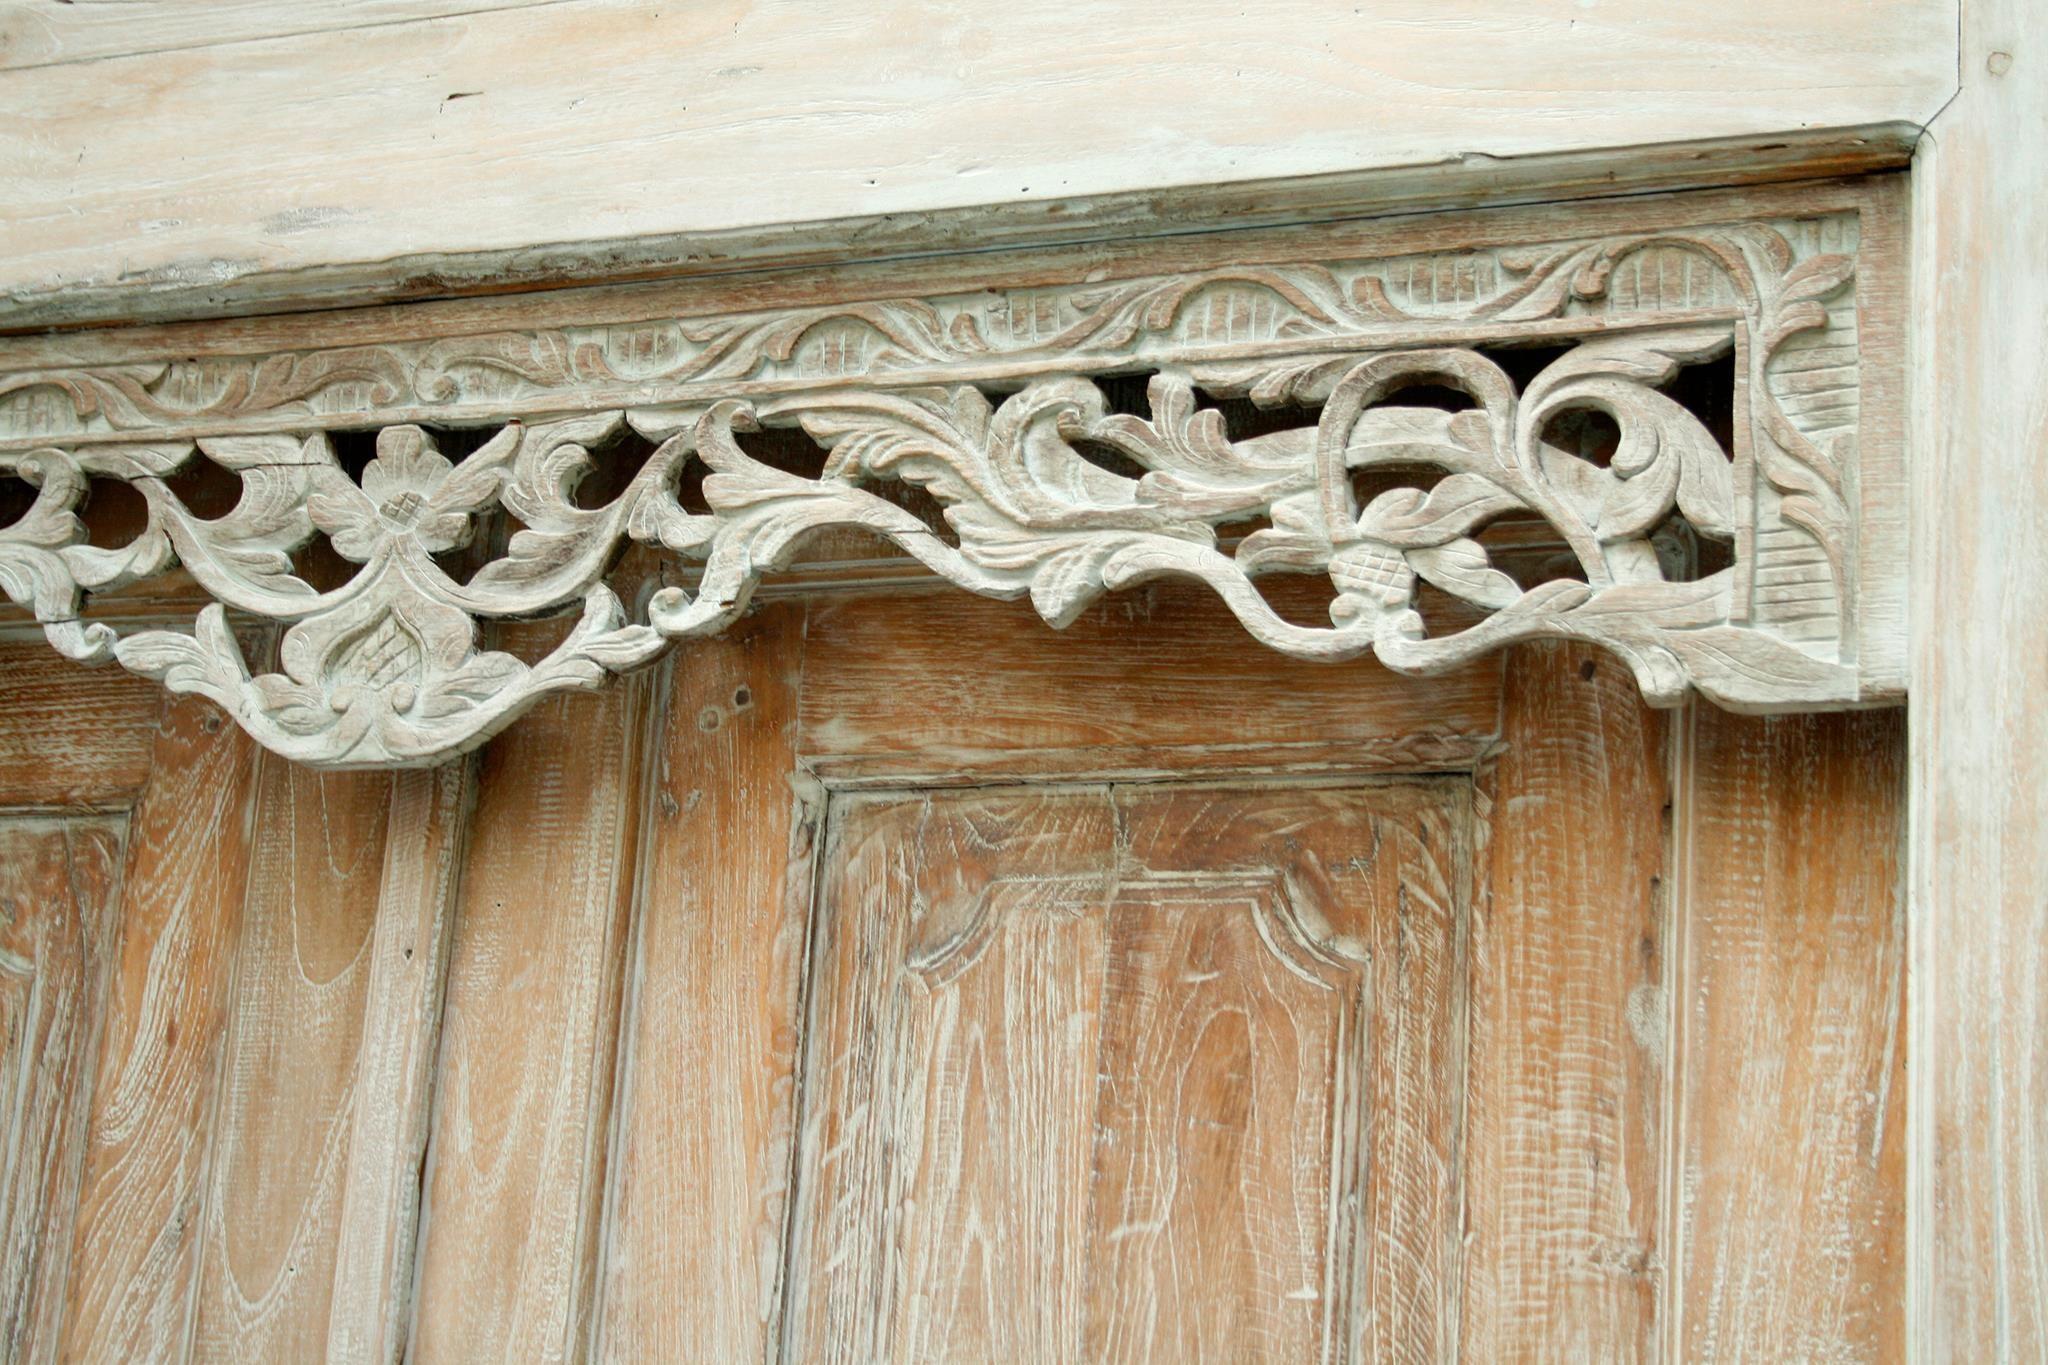 marco de puertas tallado en madera | marcos tallados | Pinterest ...